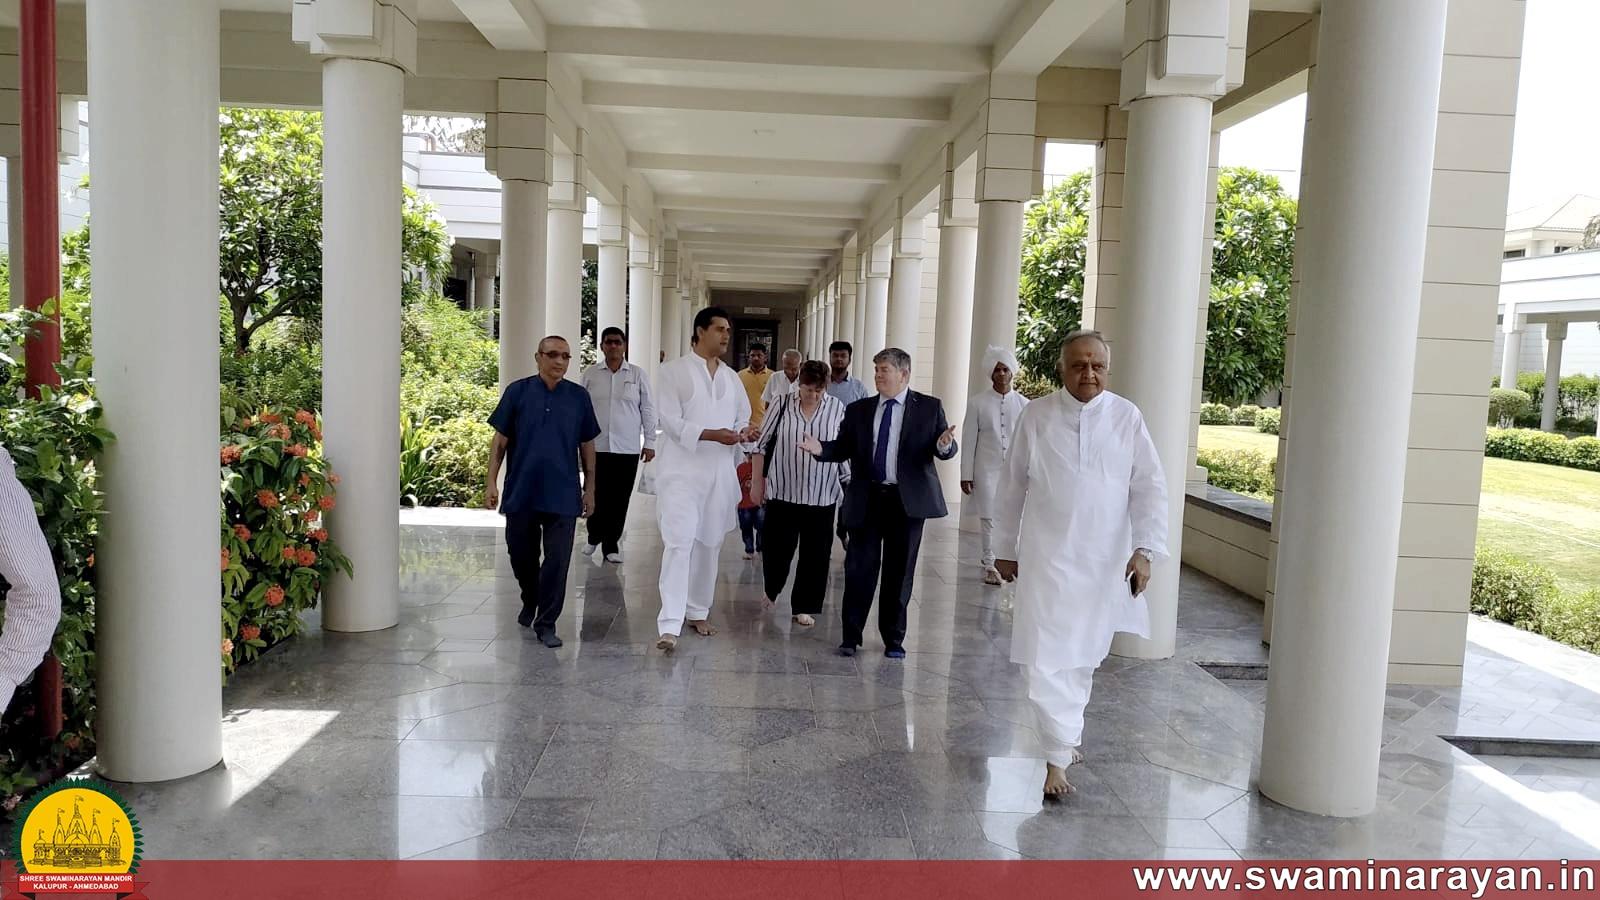 British Deputy High Commisioner visit to Swaminarayn Museum